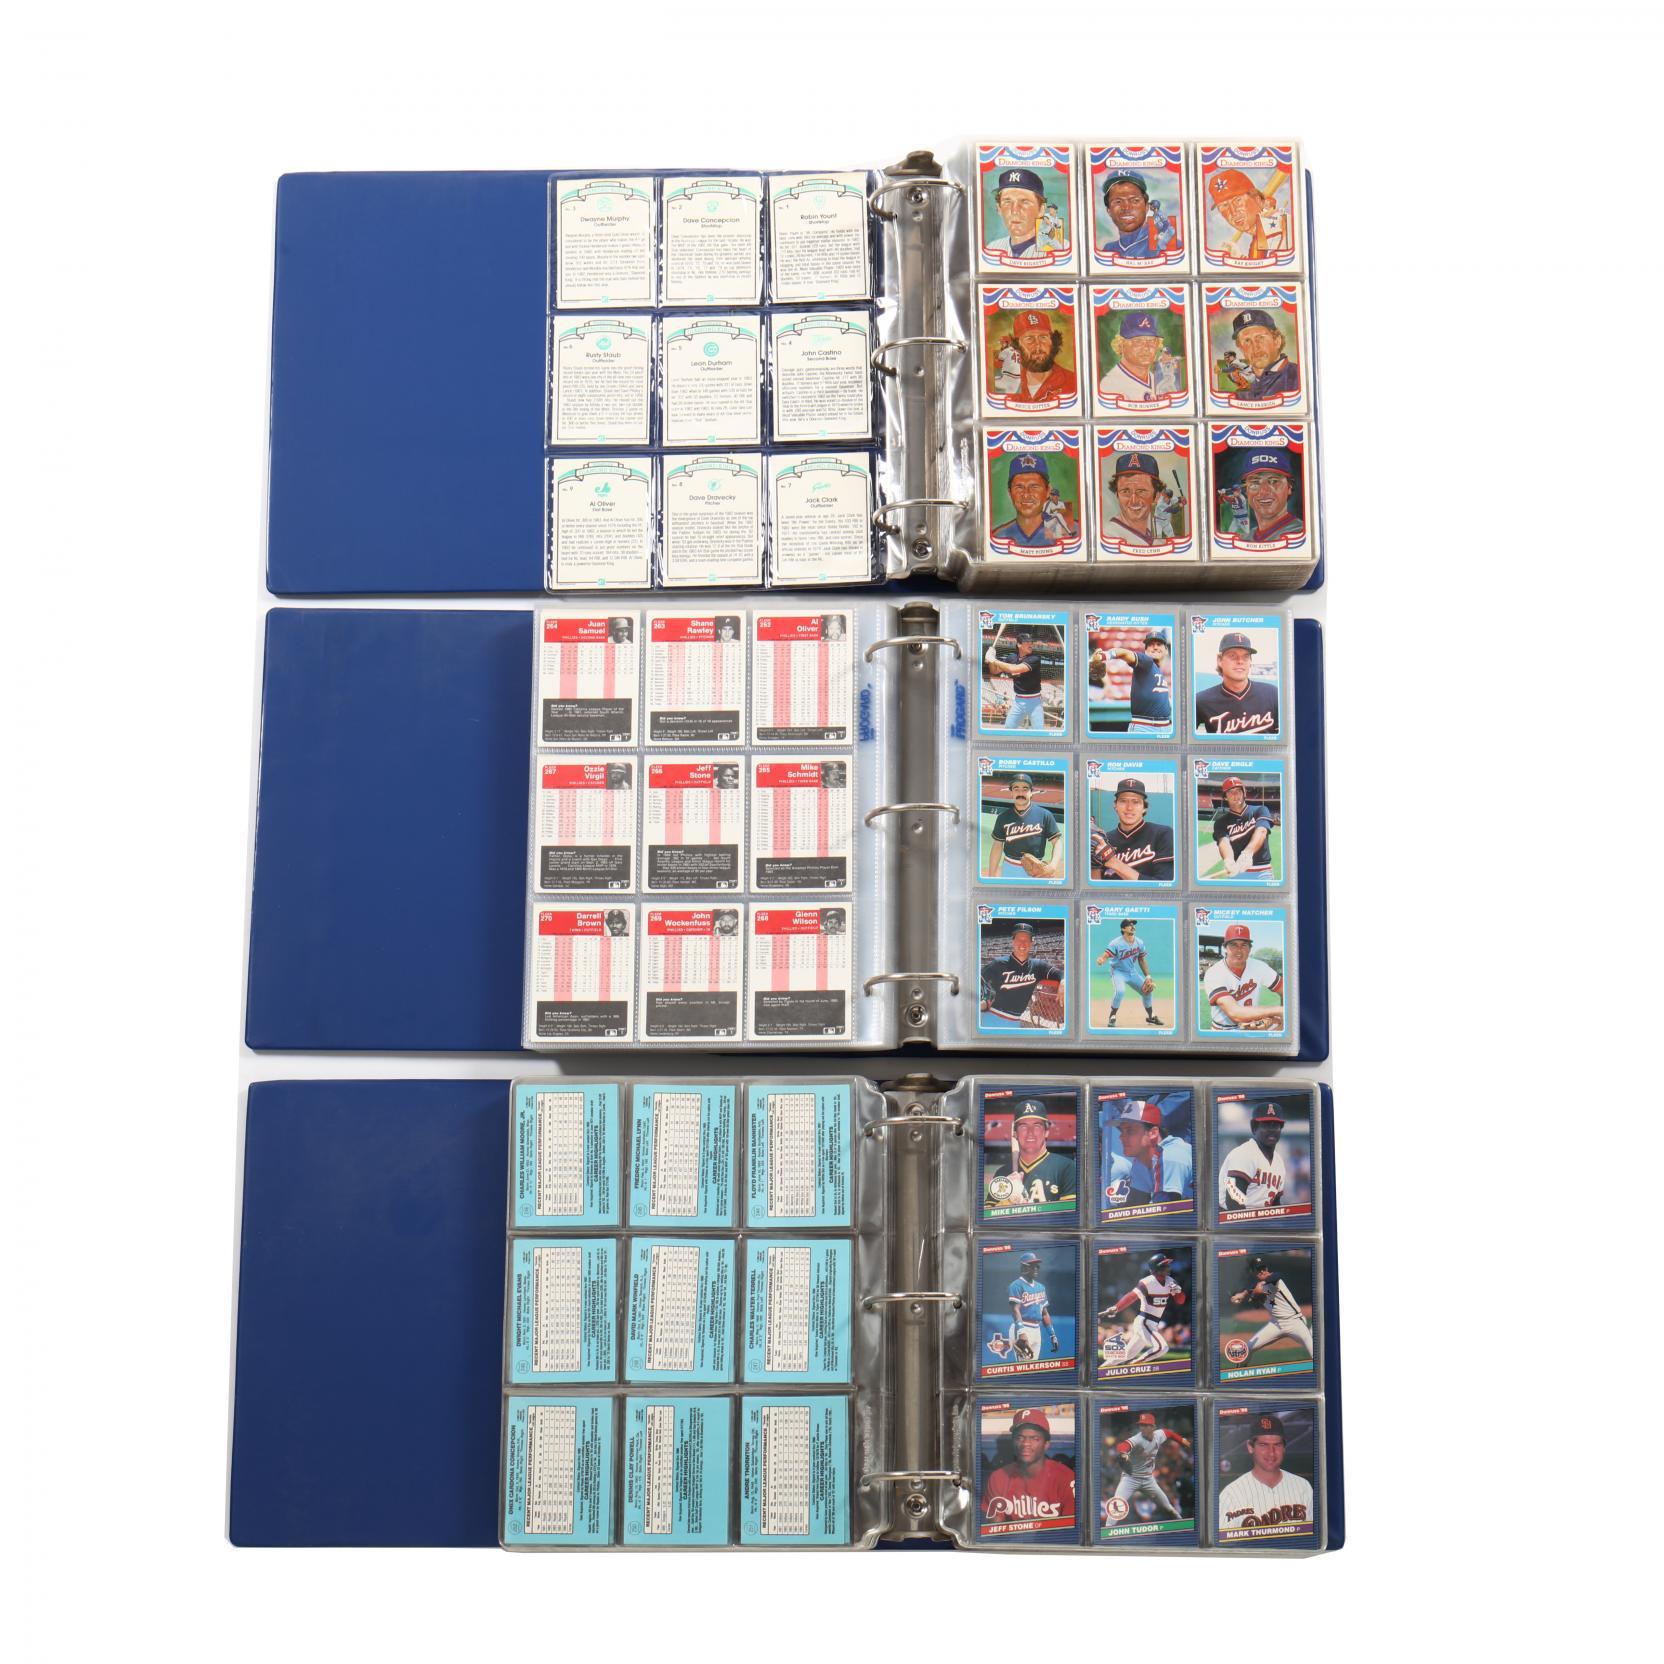 three-baseball-card-albums-1984-85-and-86-donruss-and-fleer